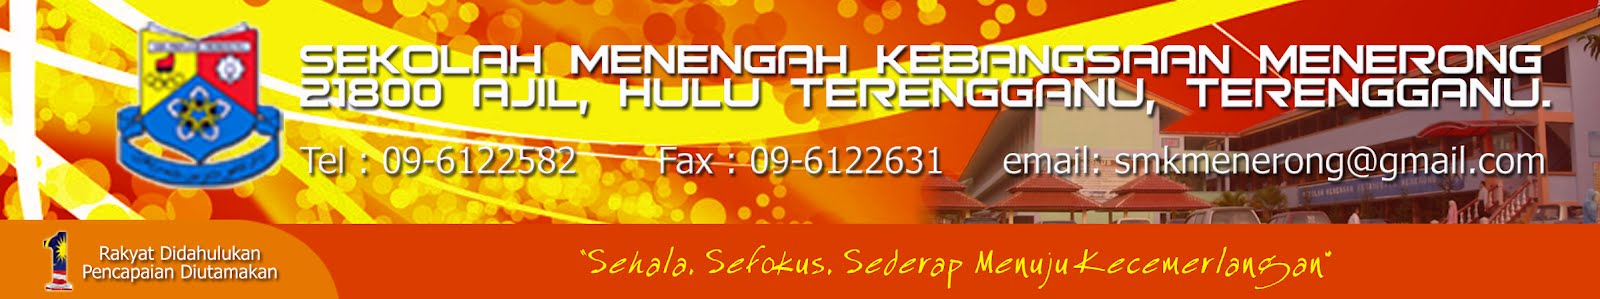 SMK Menerong